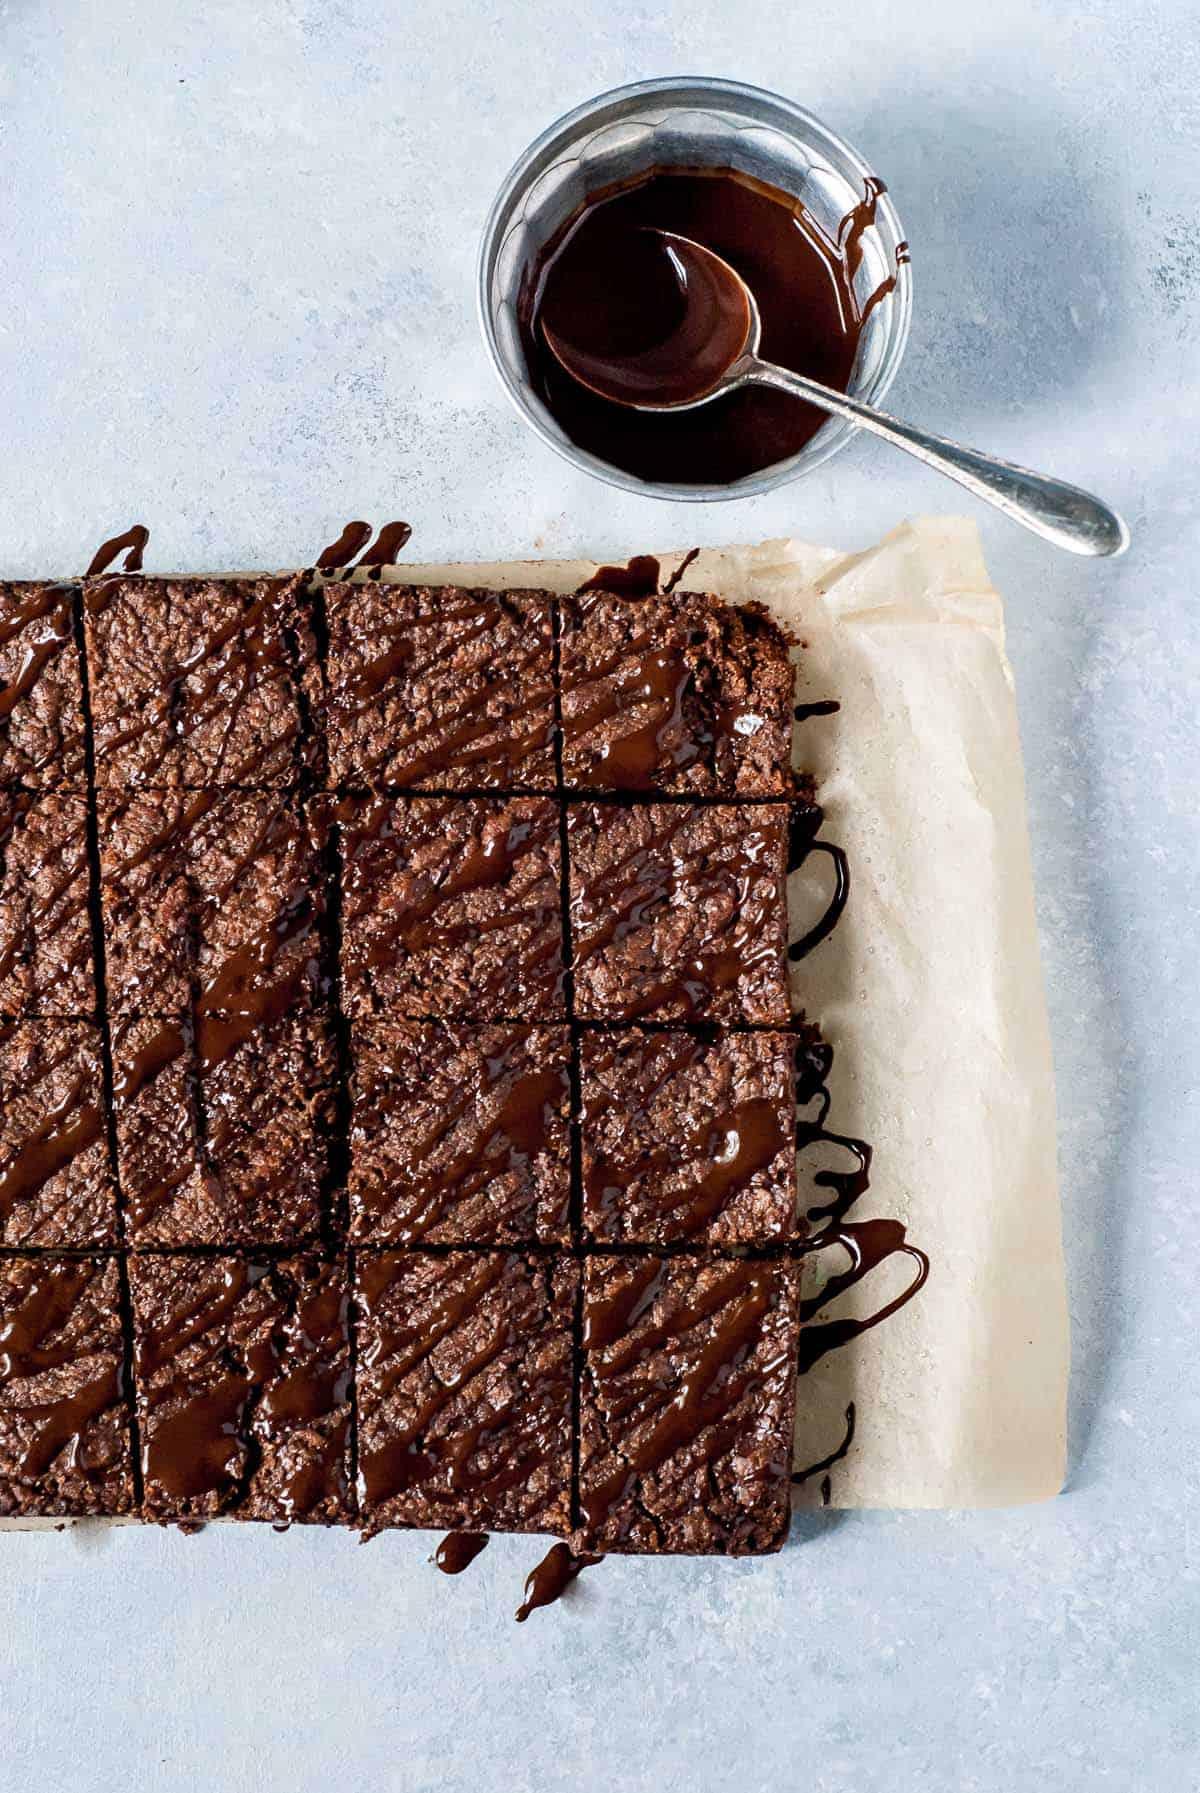 Chocolate shortbread cut into pieces on blue board